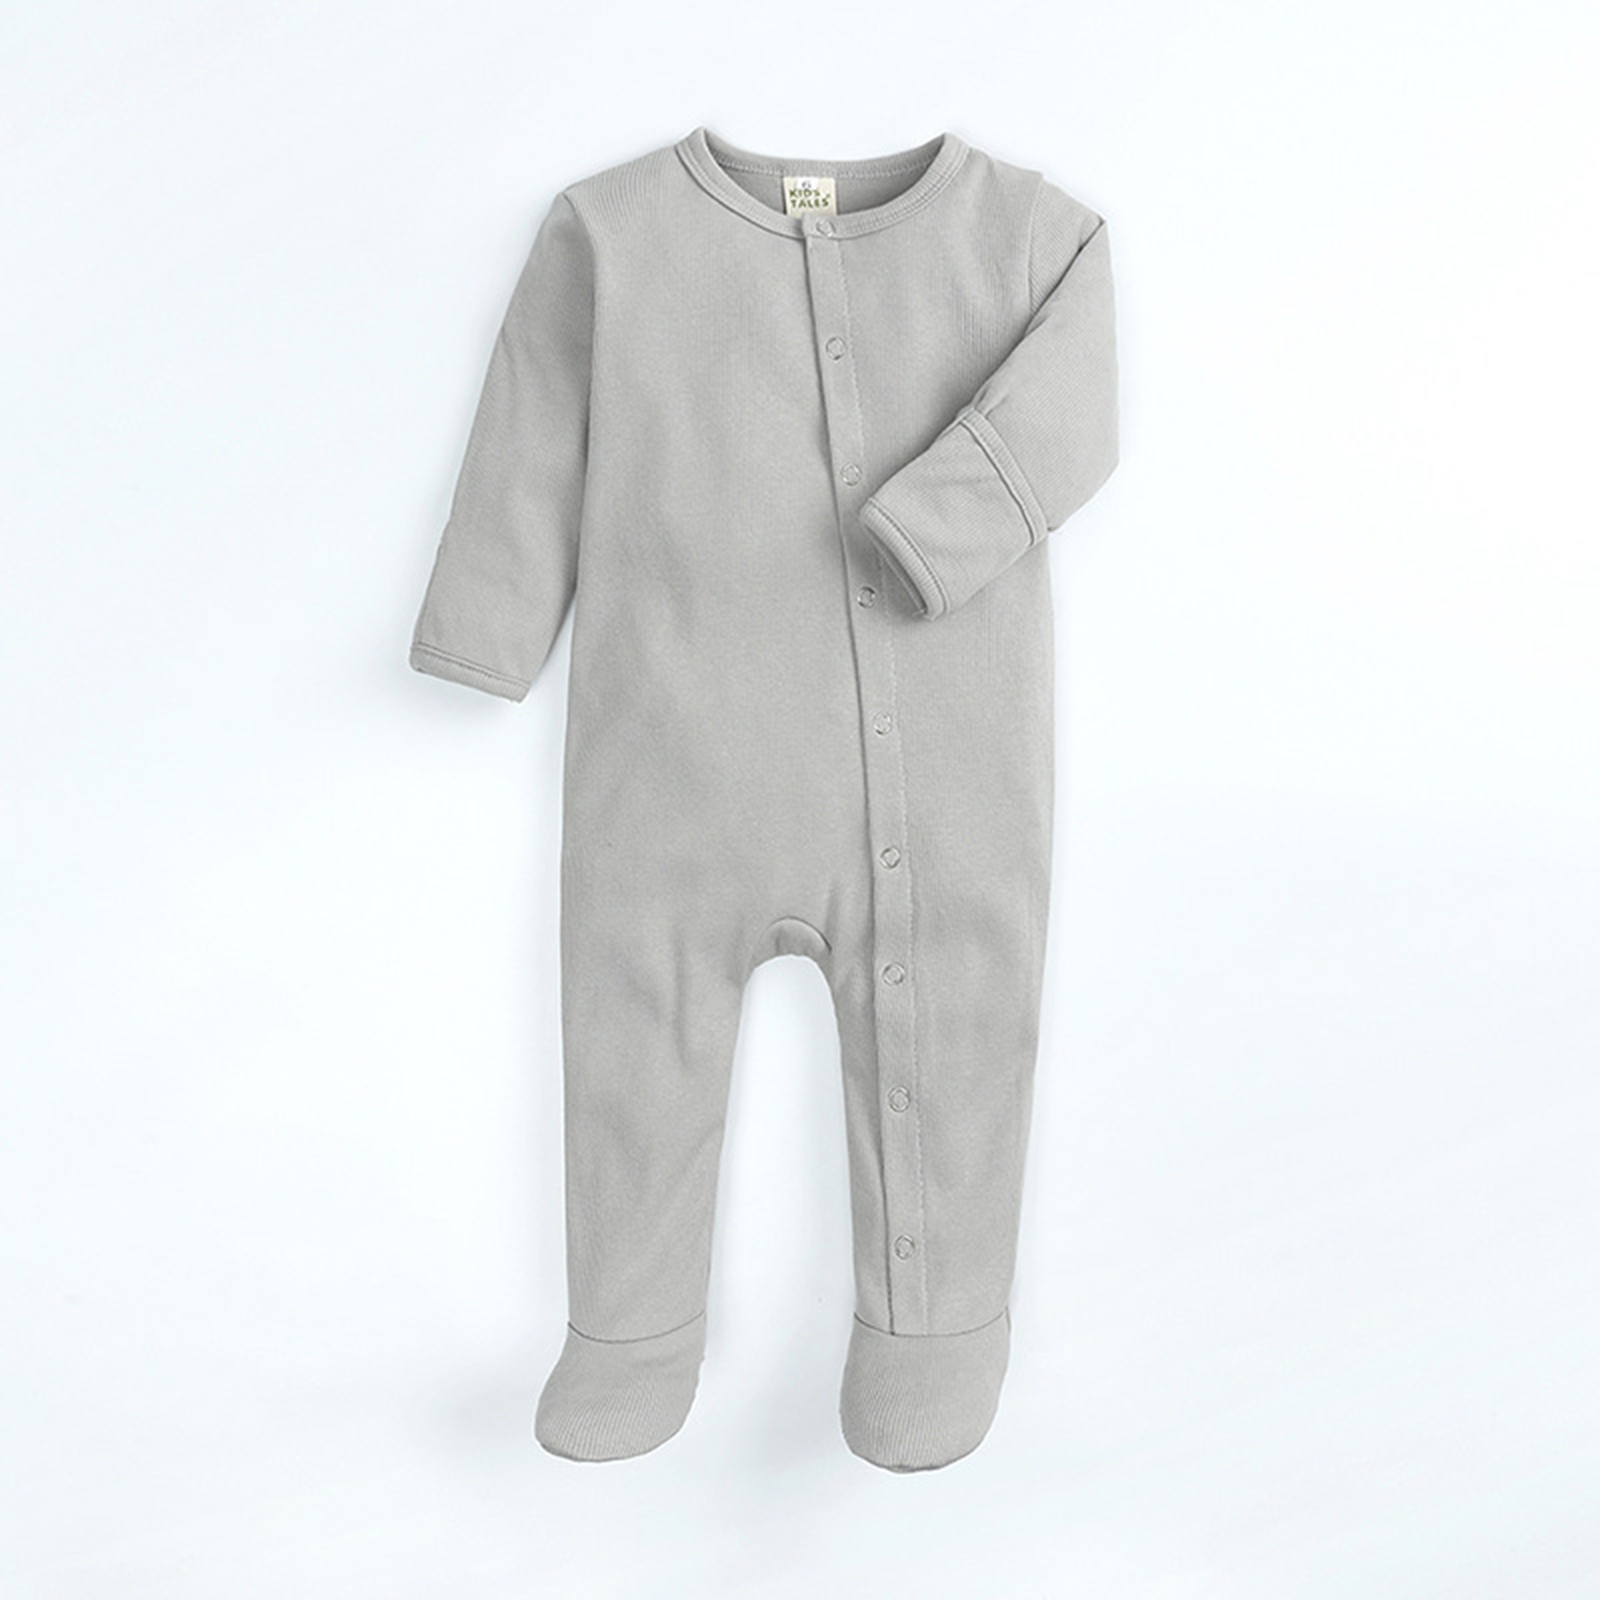 BABYGROW 100/% COTTON,BODY SLEEPWEAR SLEEP SUIT PLAYSUIT ROMPER,NEW//BORN TO 18MTH